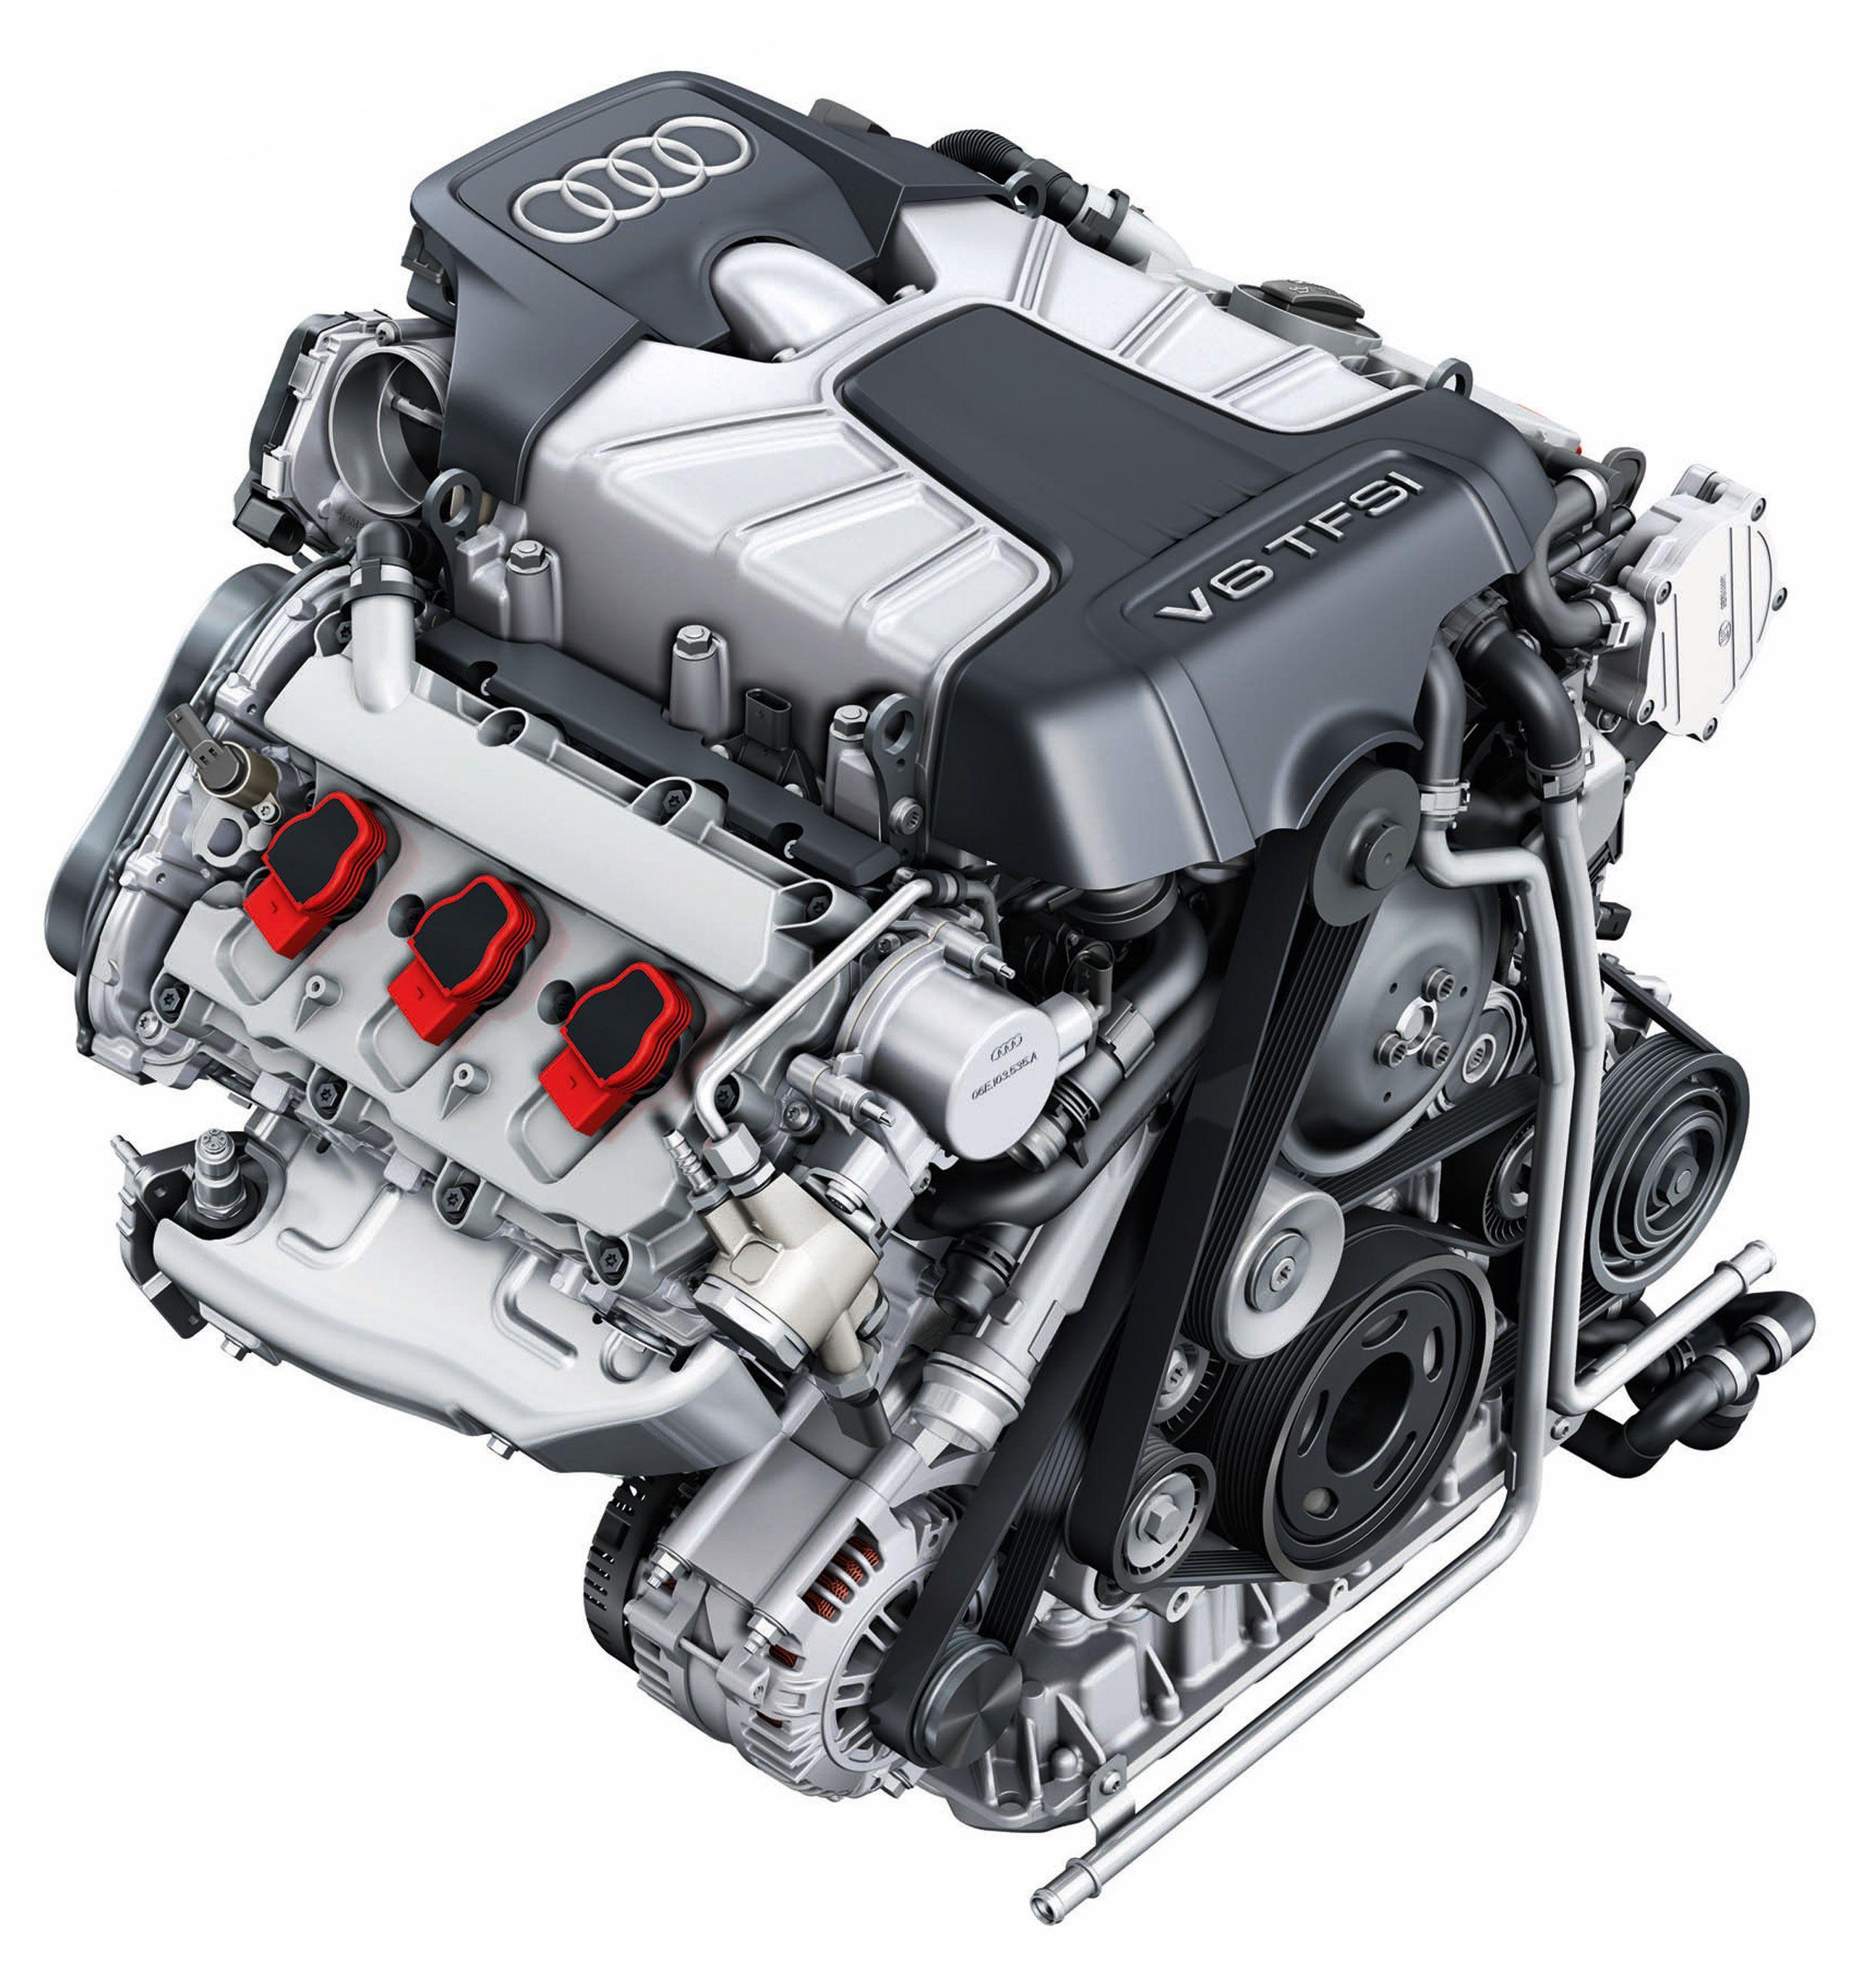 million kft hungaria its the motor today at engines engine komarjohari audi millionth medium produced